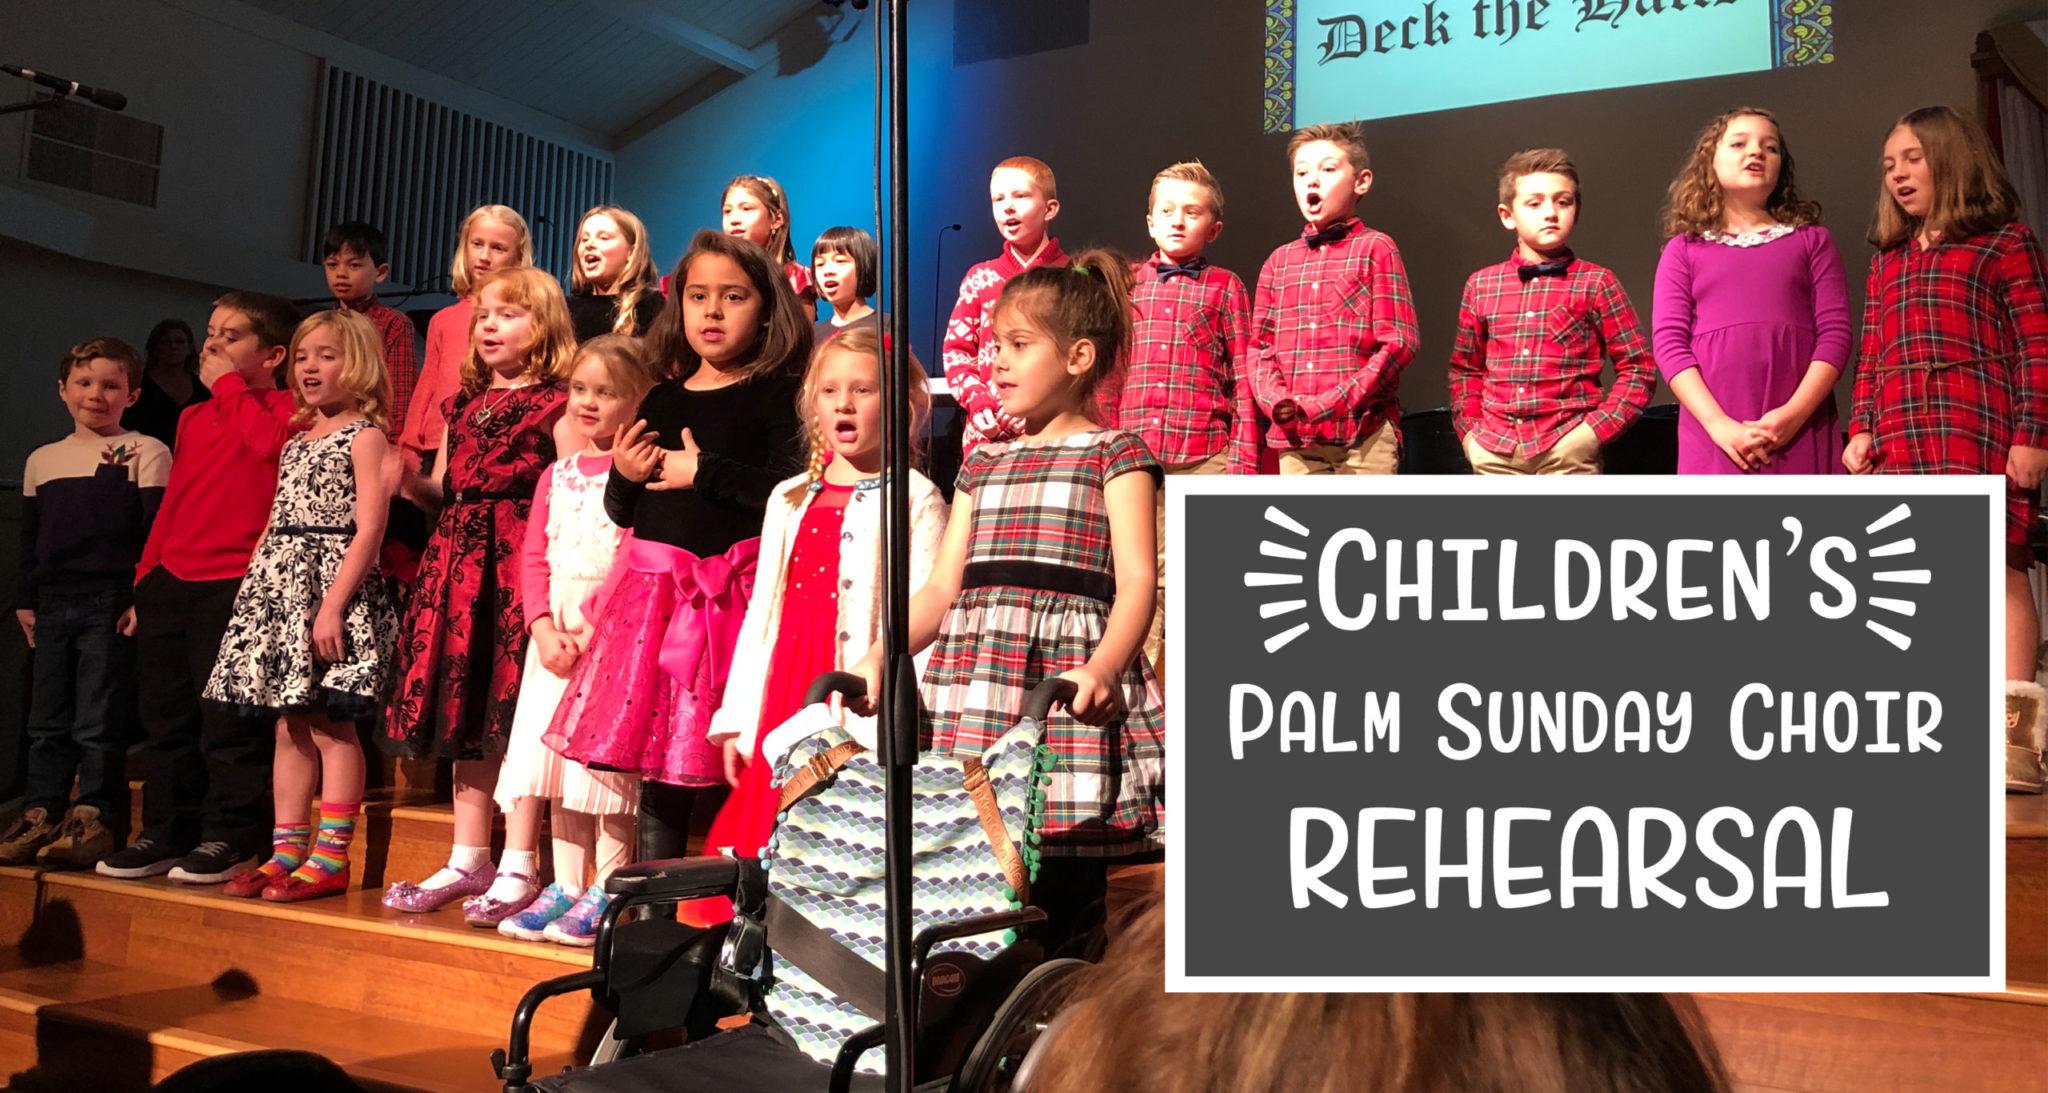 Children's Palm Sunday Choir Rehearsal